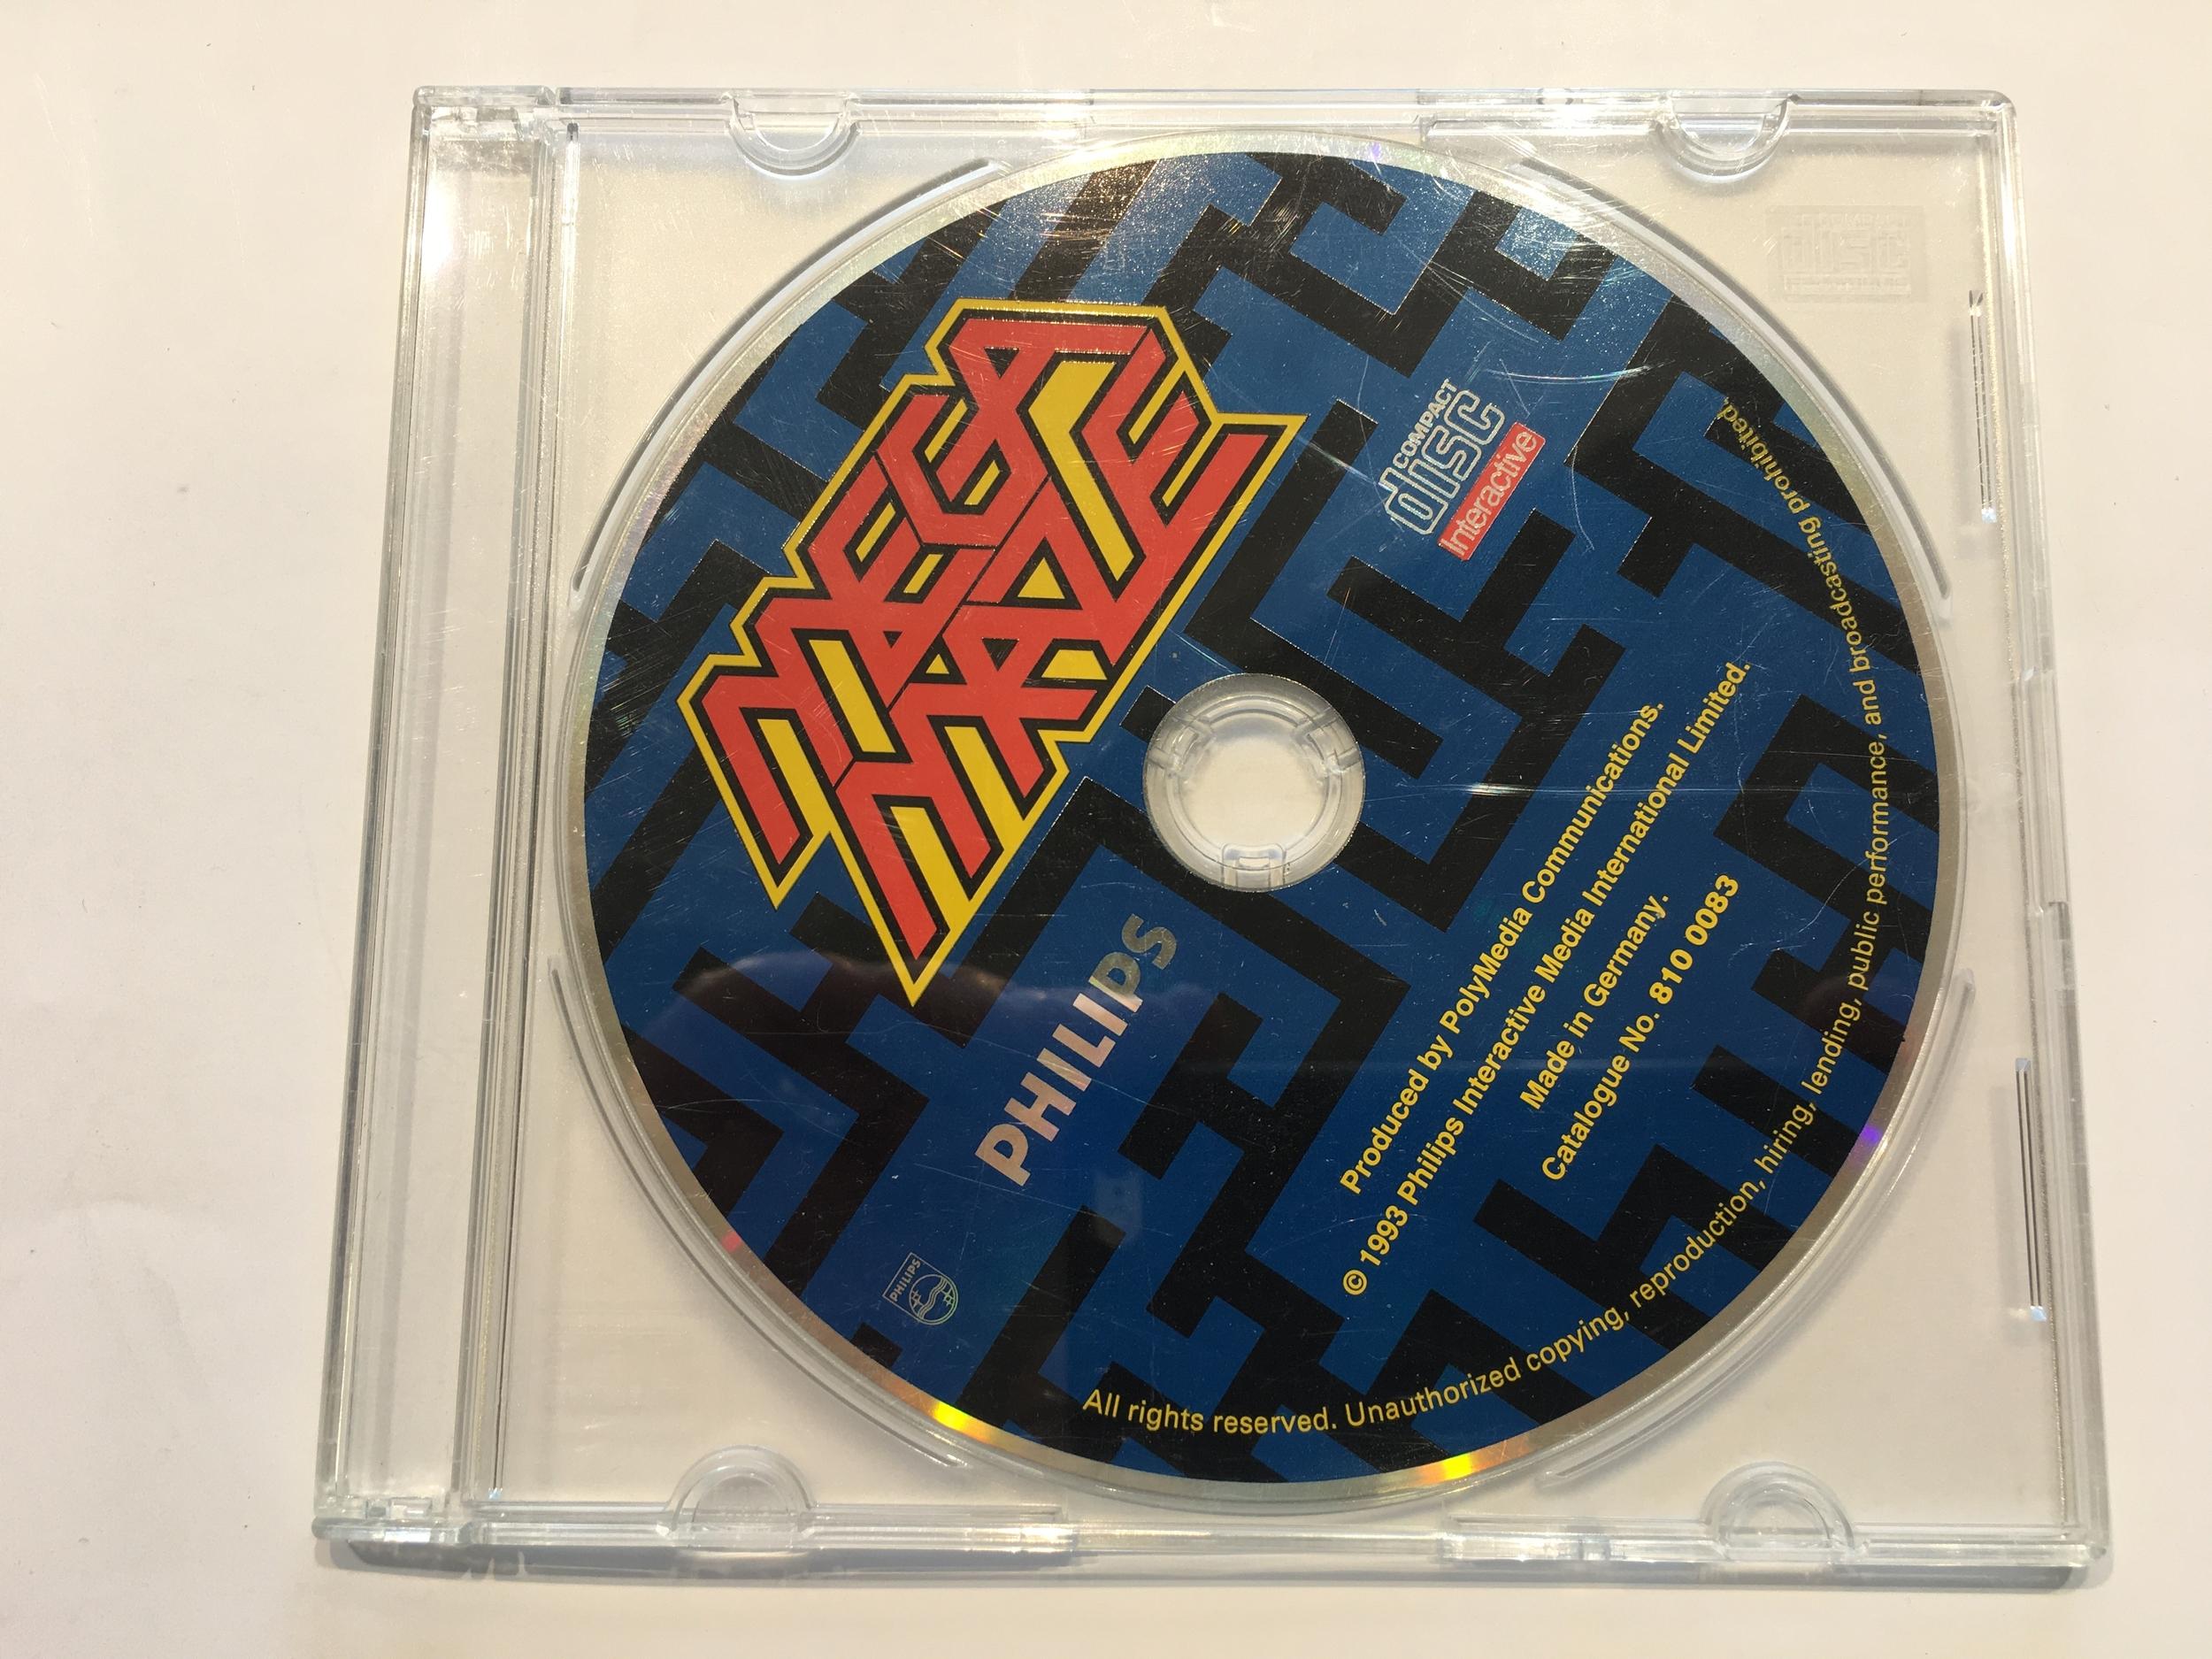 Mega Maze CD-i